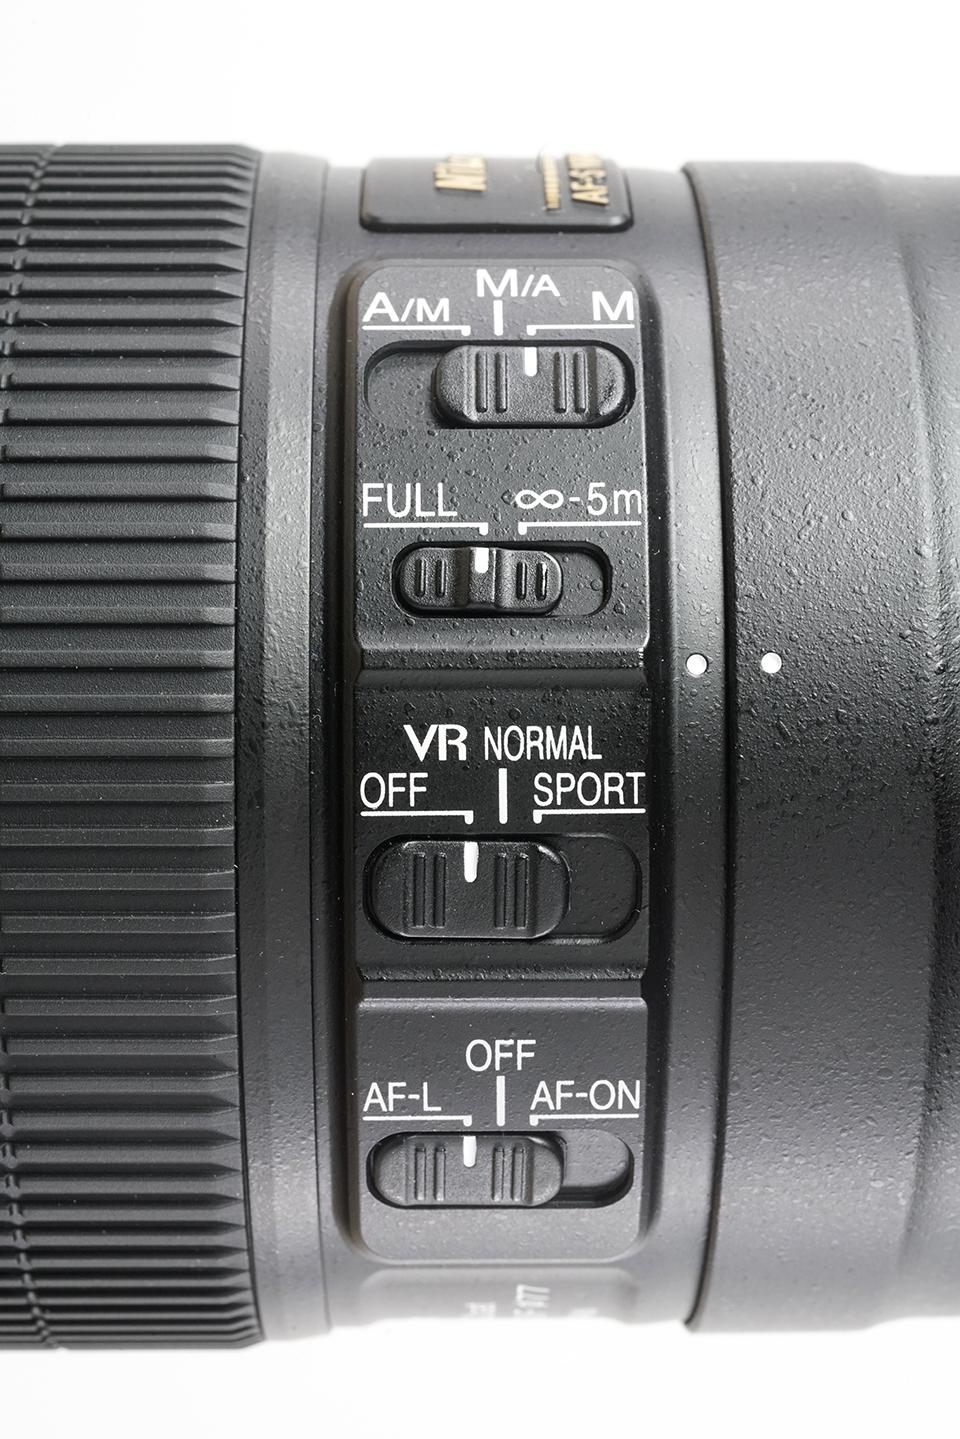 In the Field: Nikon 70-200 f/2 8 G and E Lenses Compared